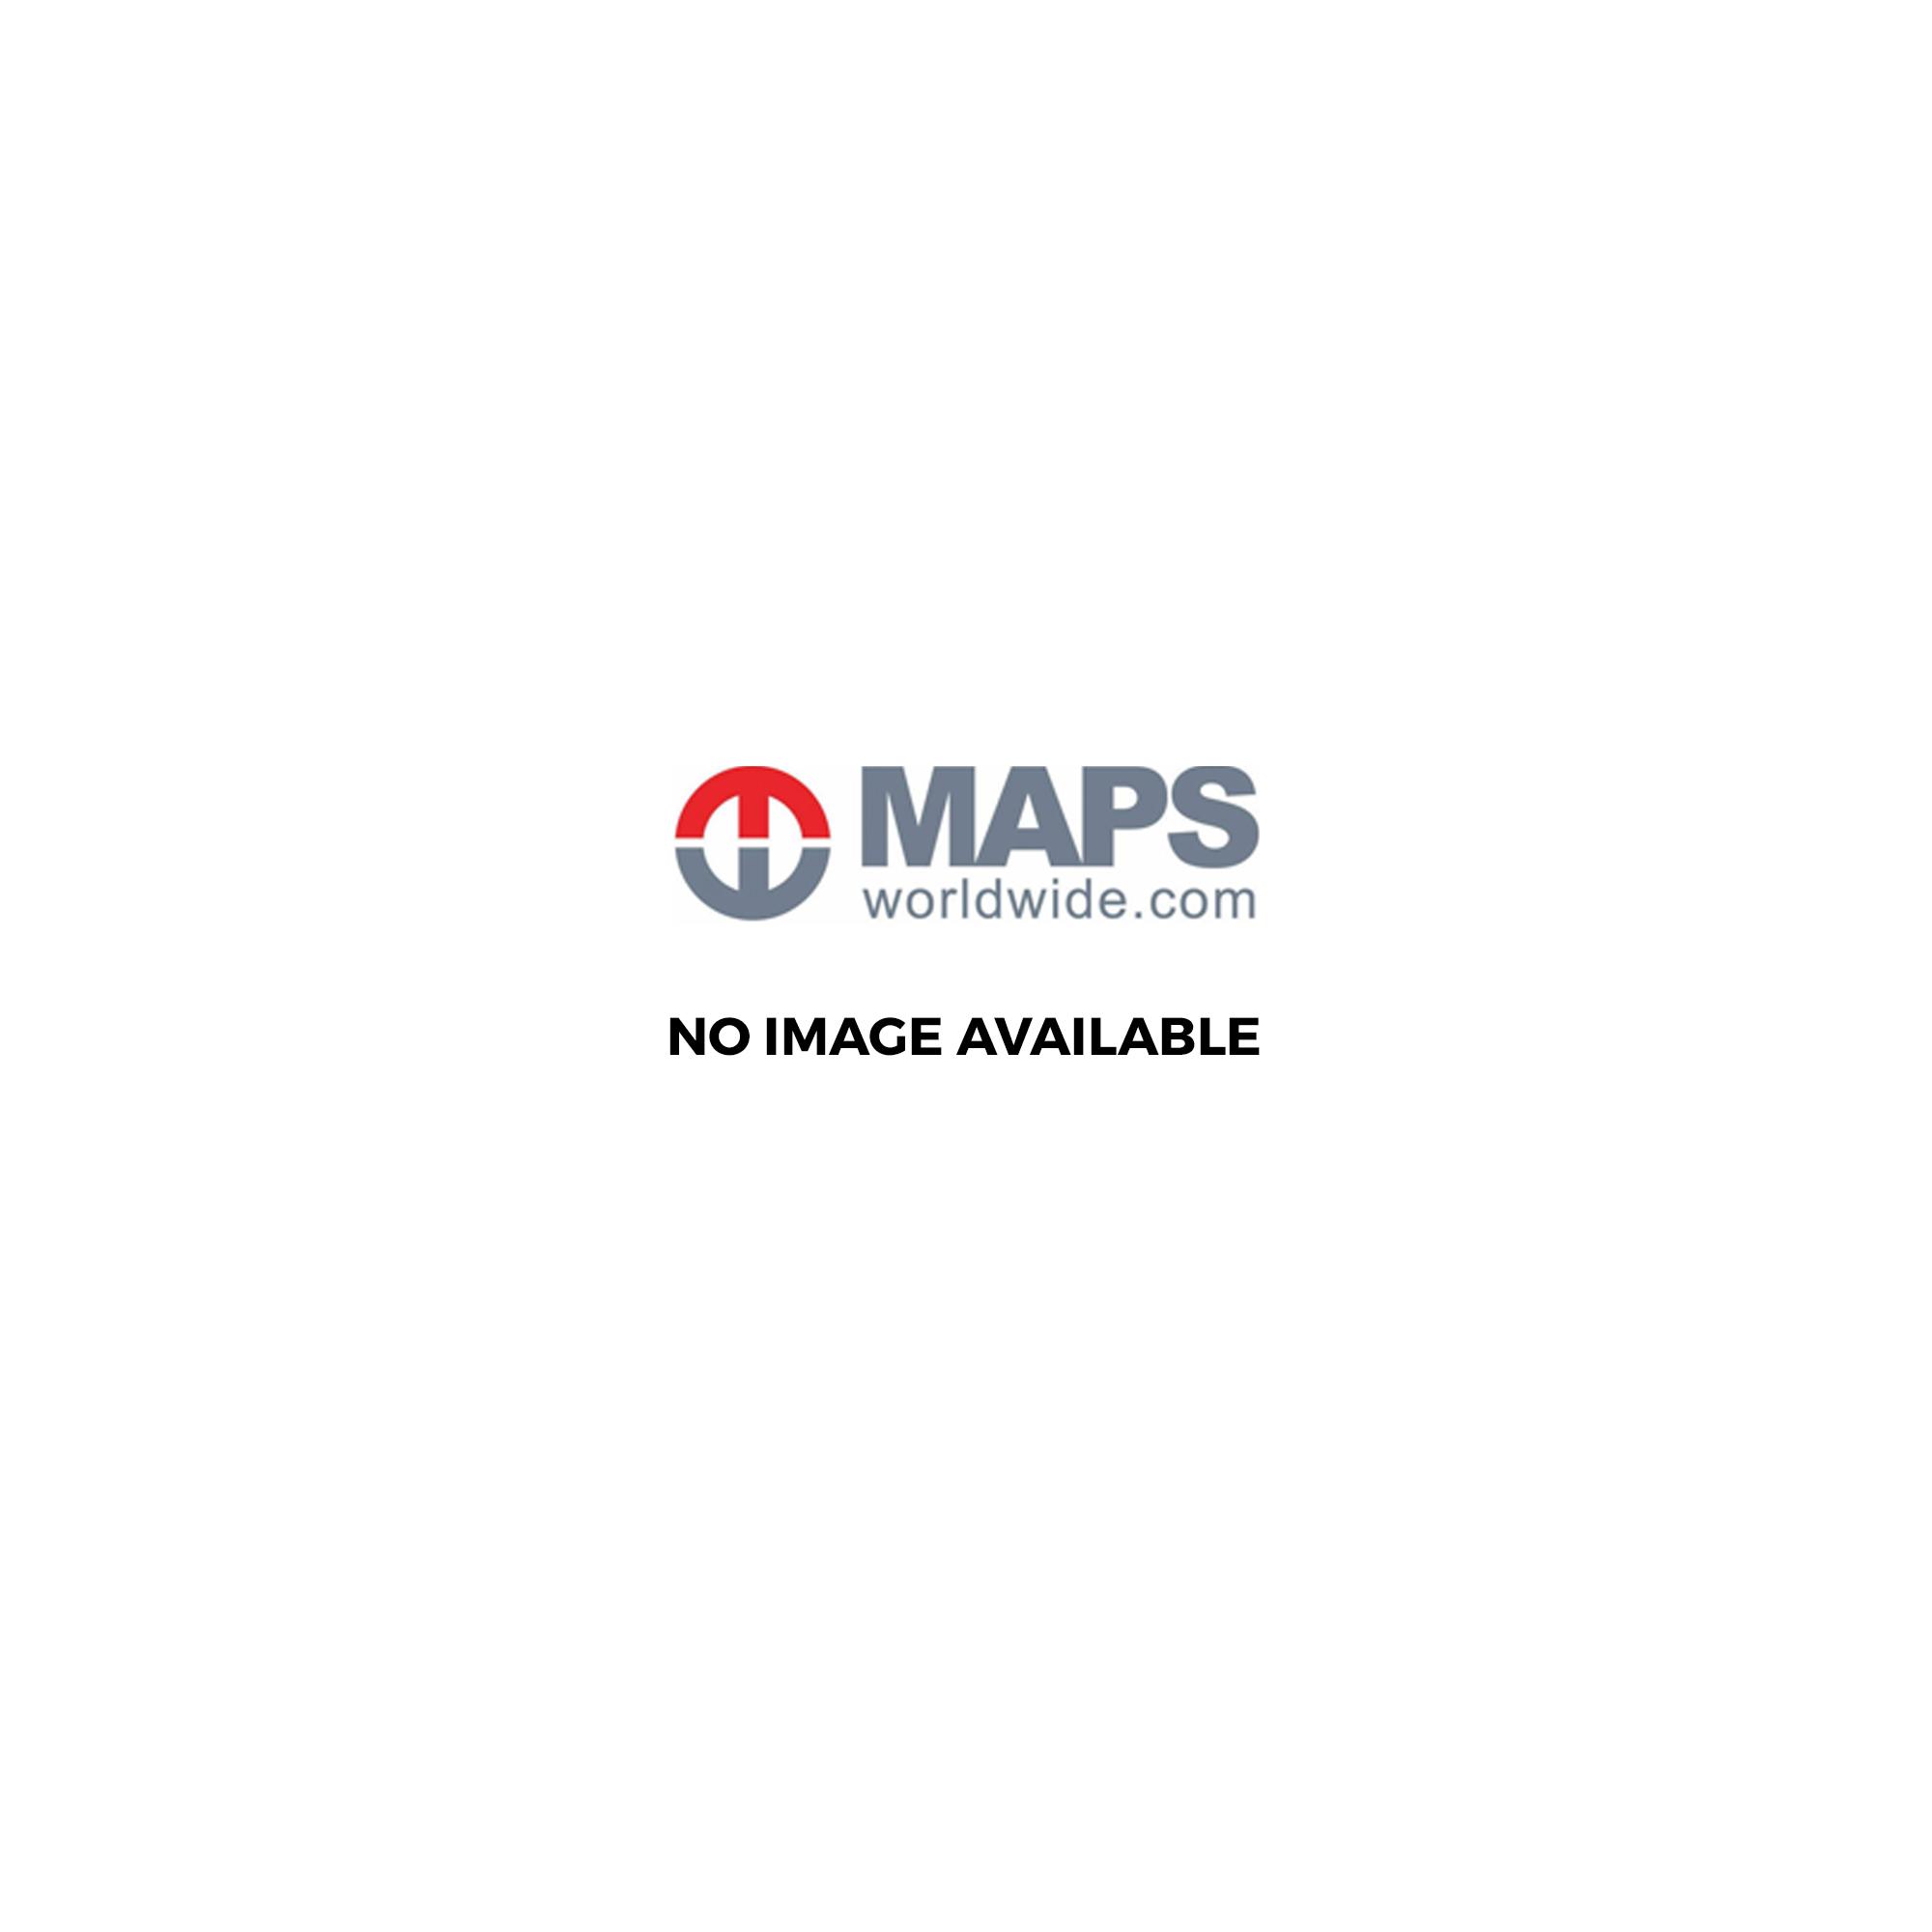 Road Map Of Florida And Georgia.Top 10 Punto Medio Noticias Road Map Of Florida